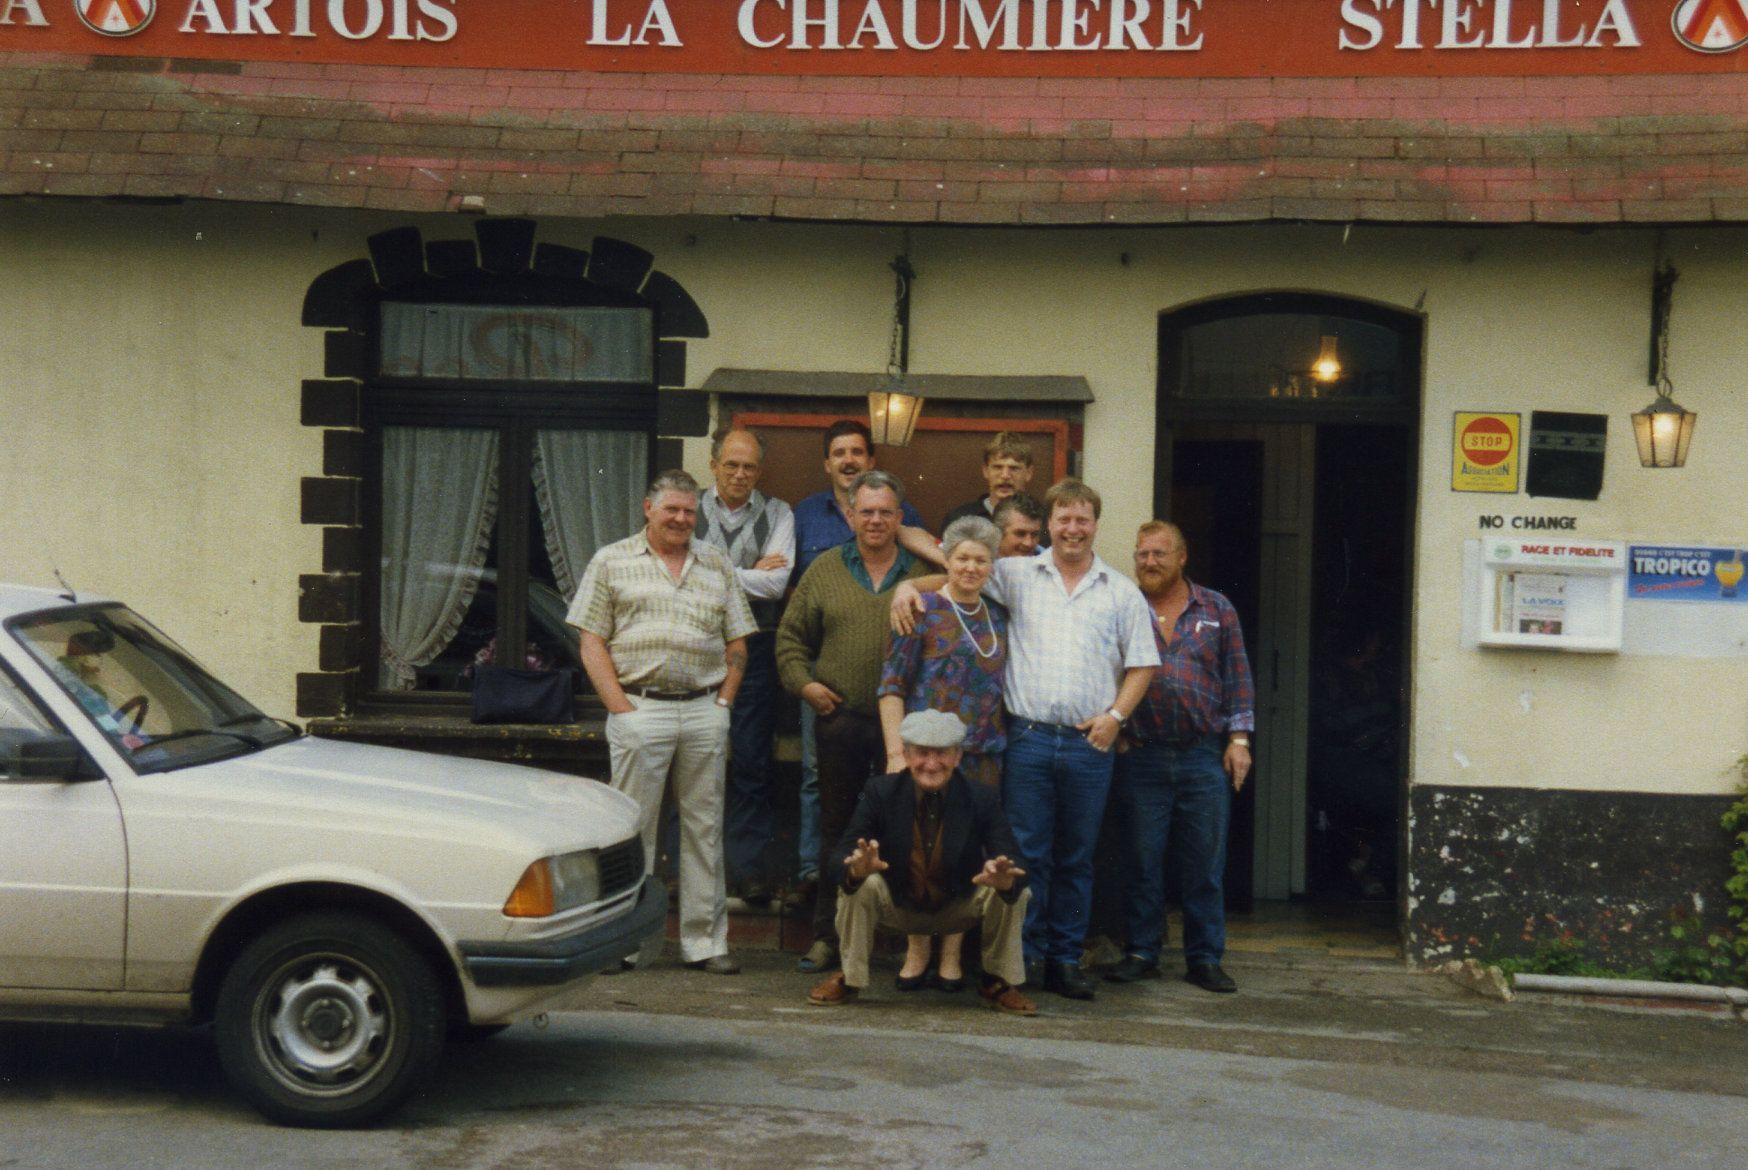 Pascal-Booij--Truckstop-Bapaume-1988--favorite-cafe-4